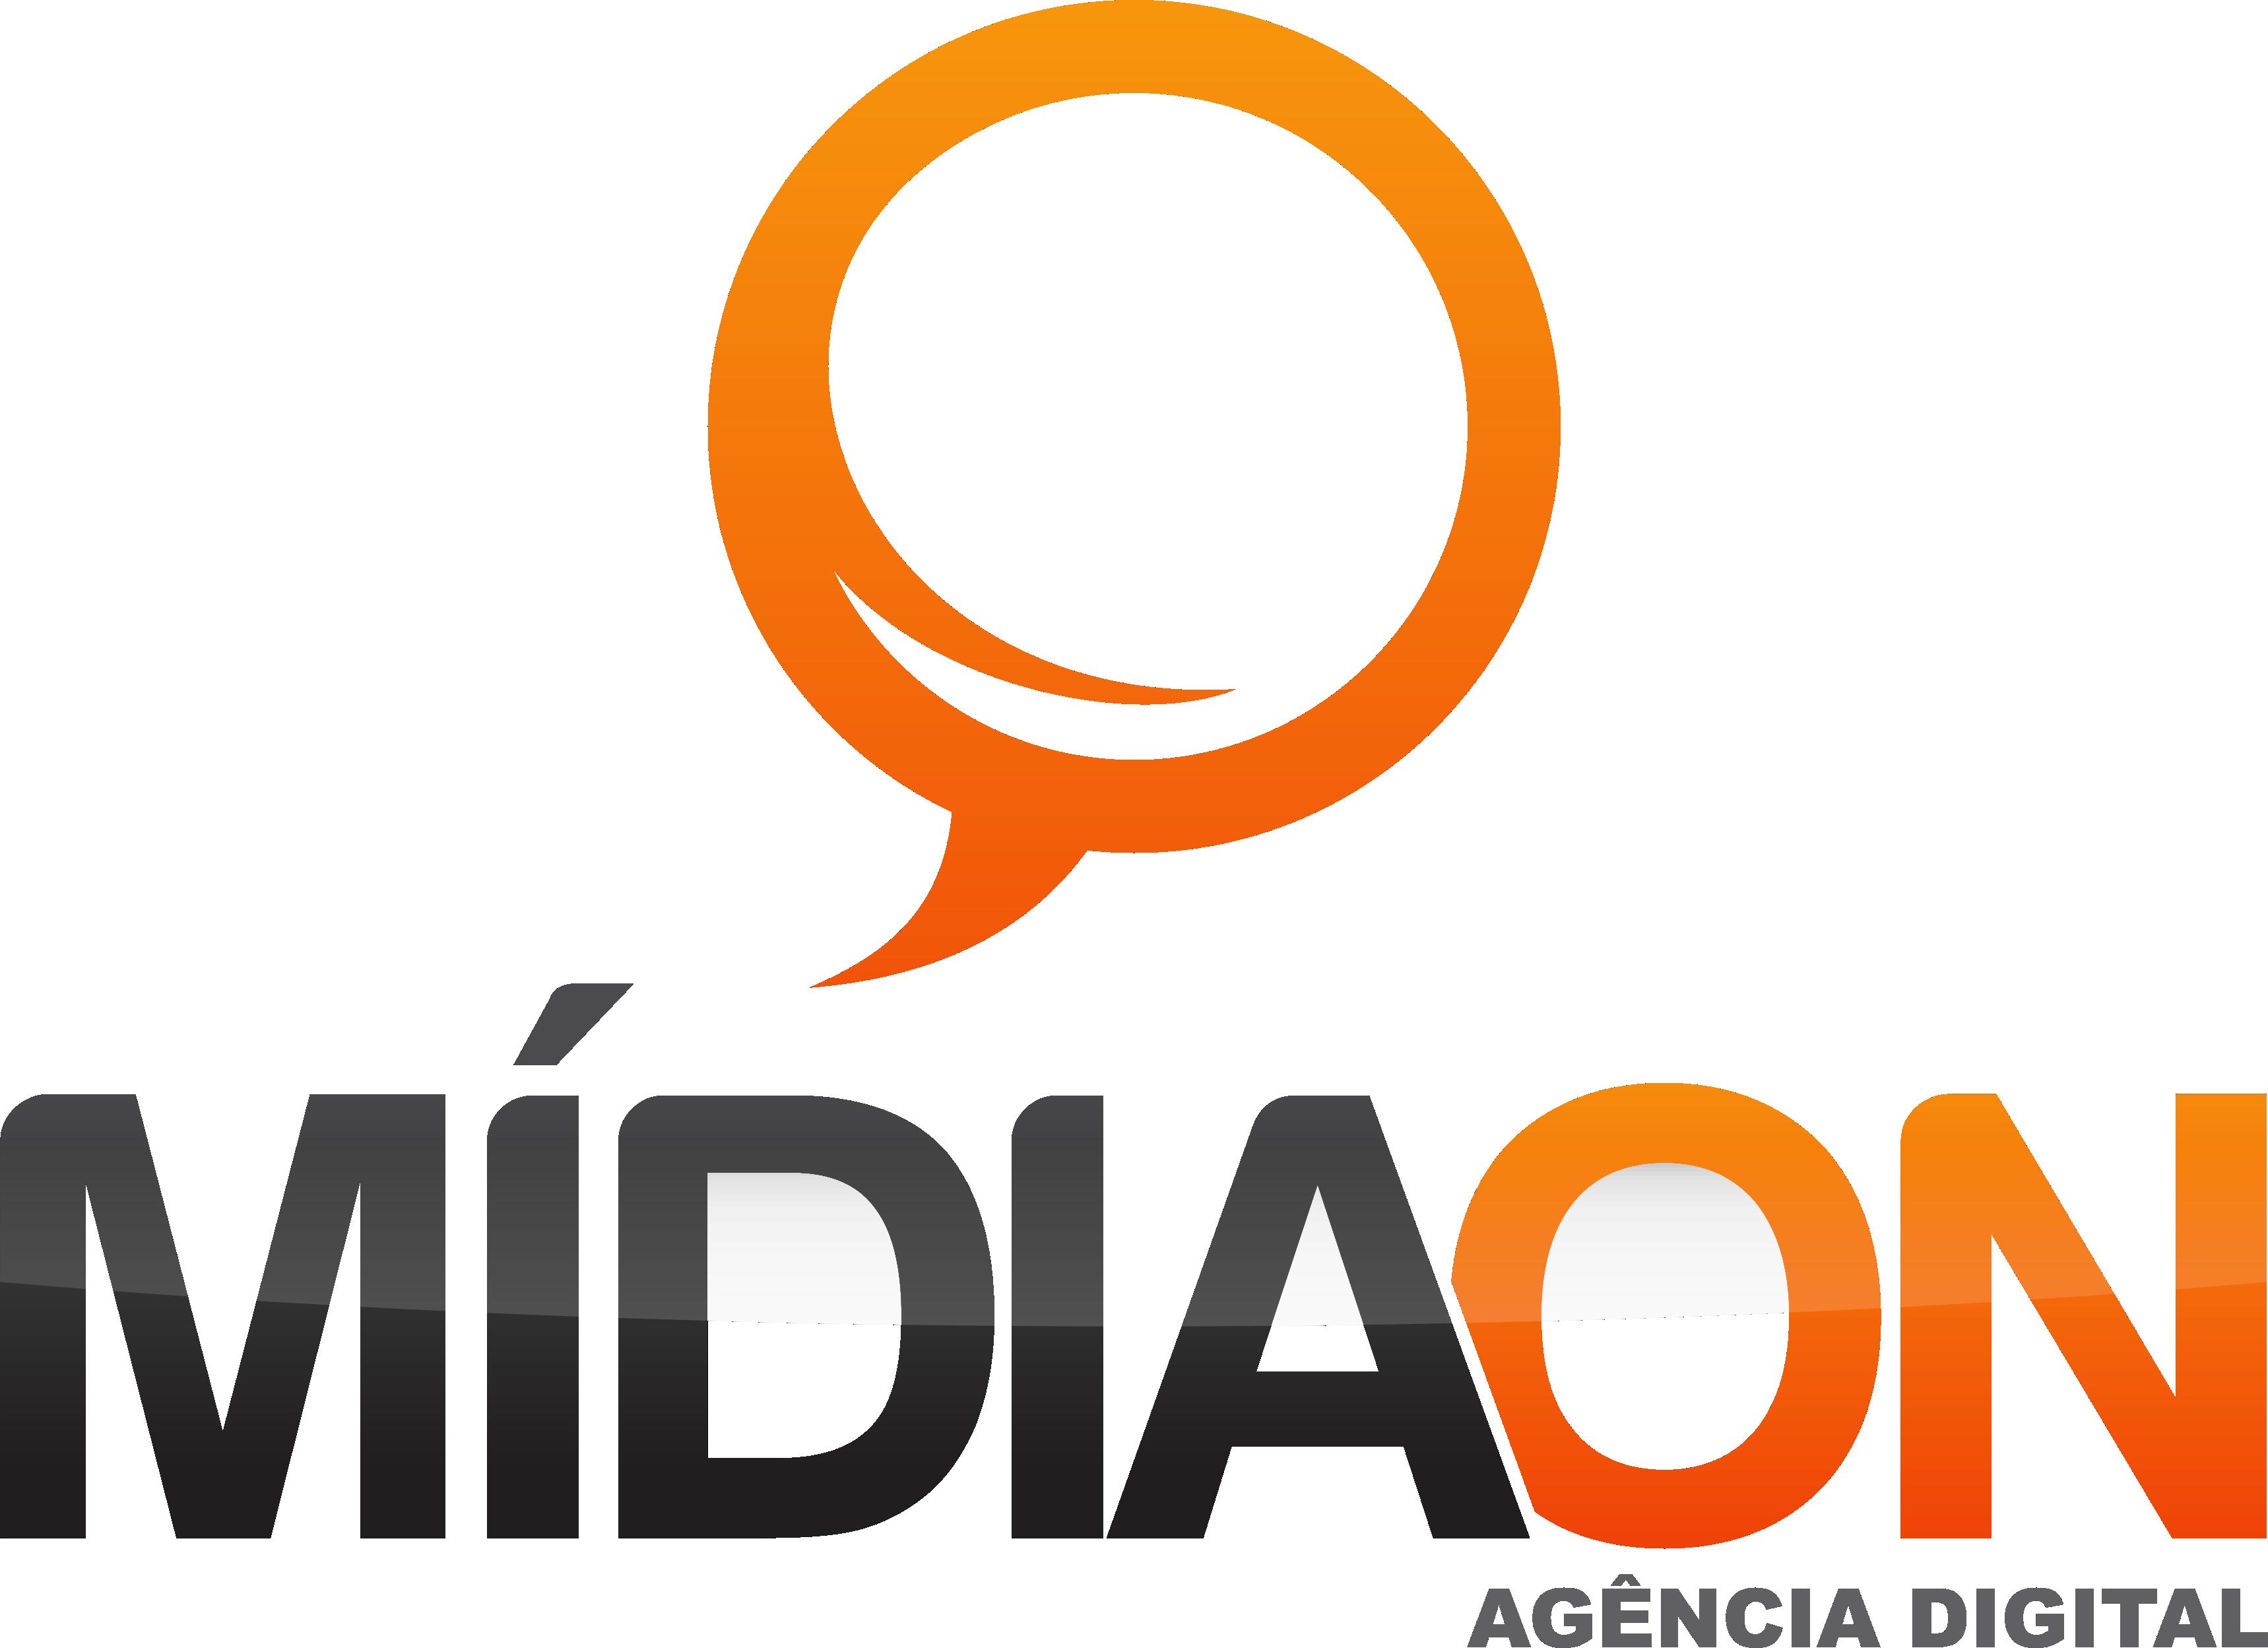 MídiaOn Agência Digital